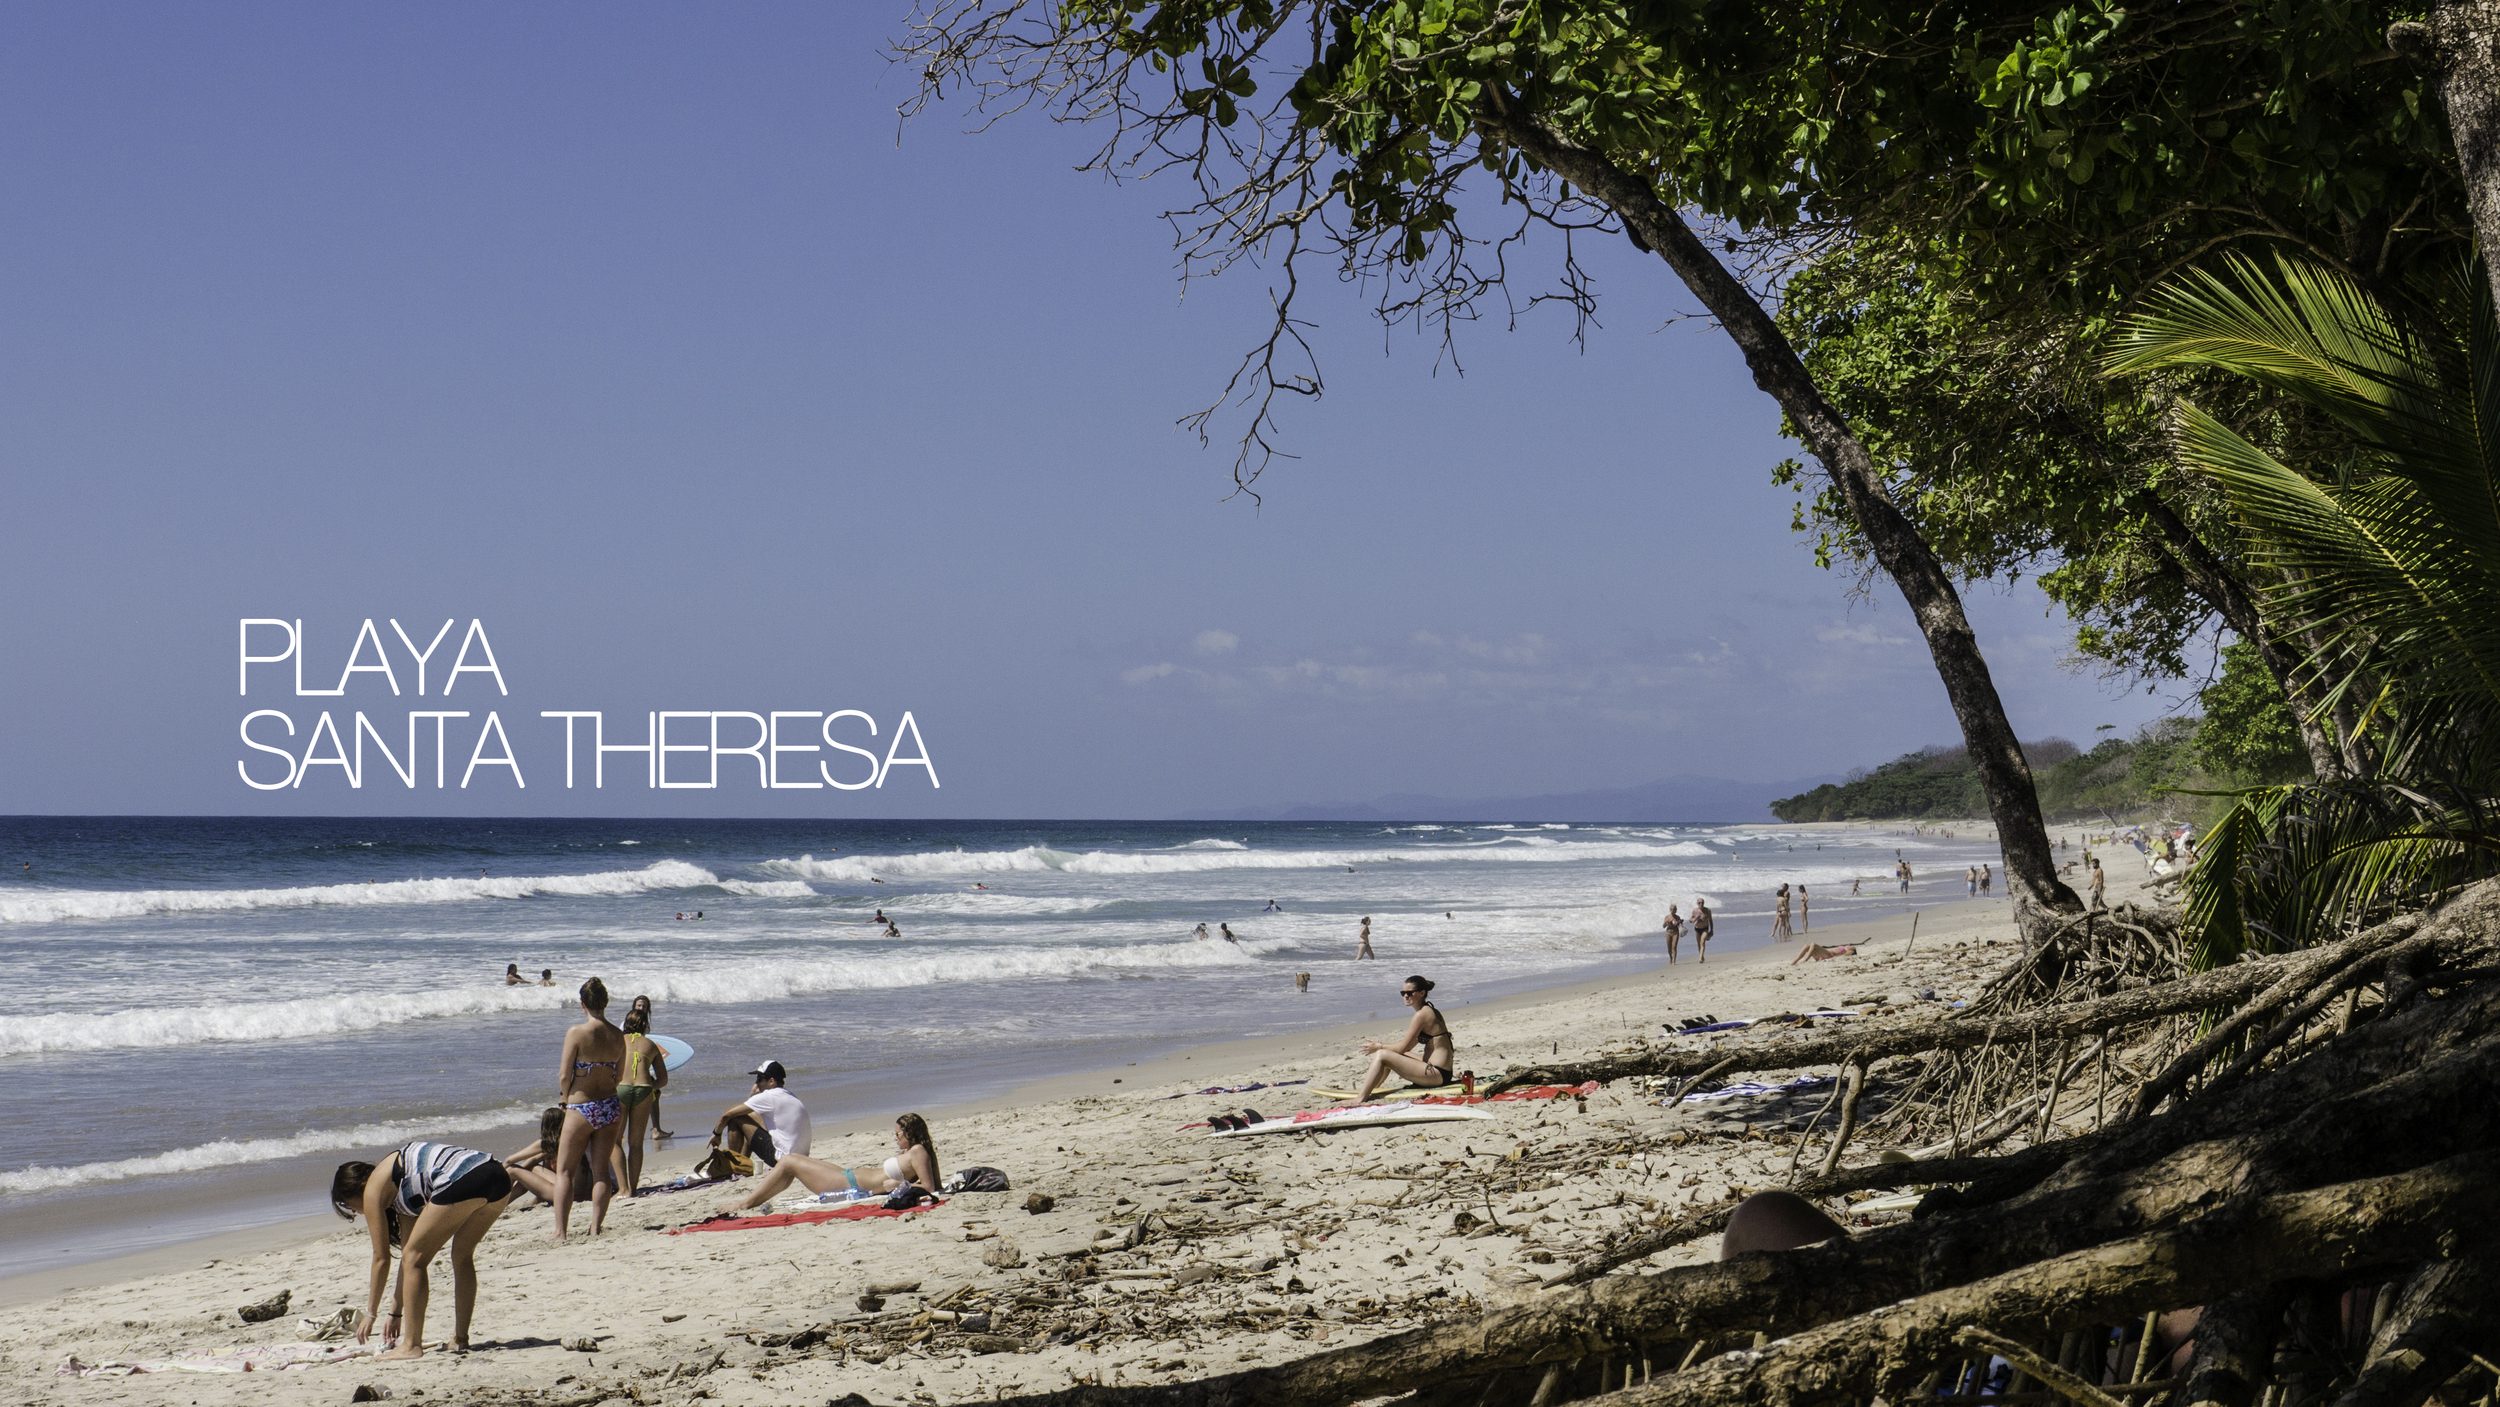 playa-santa-theresa.jpg